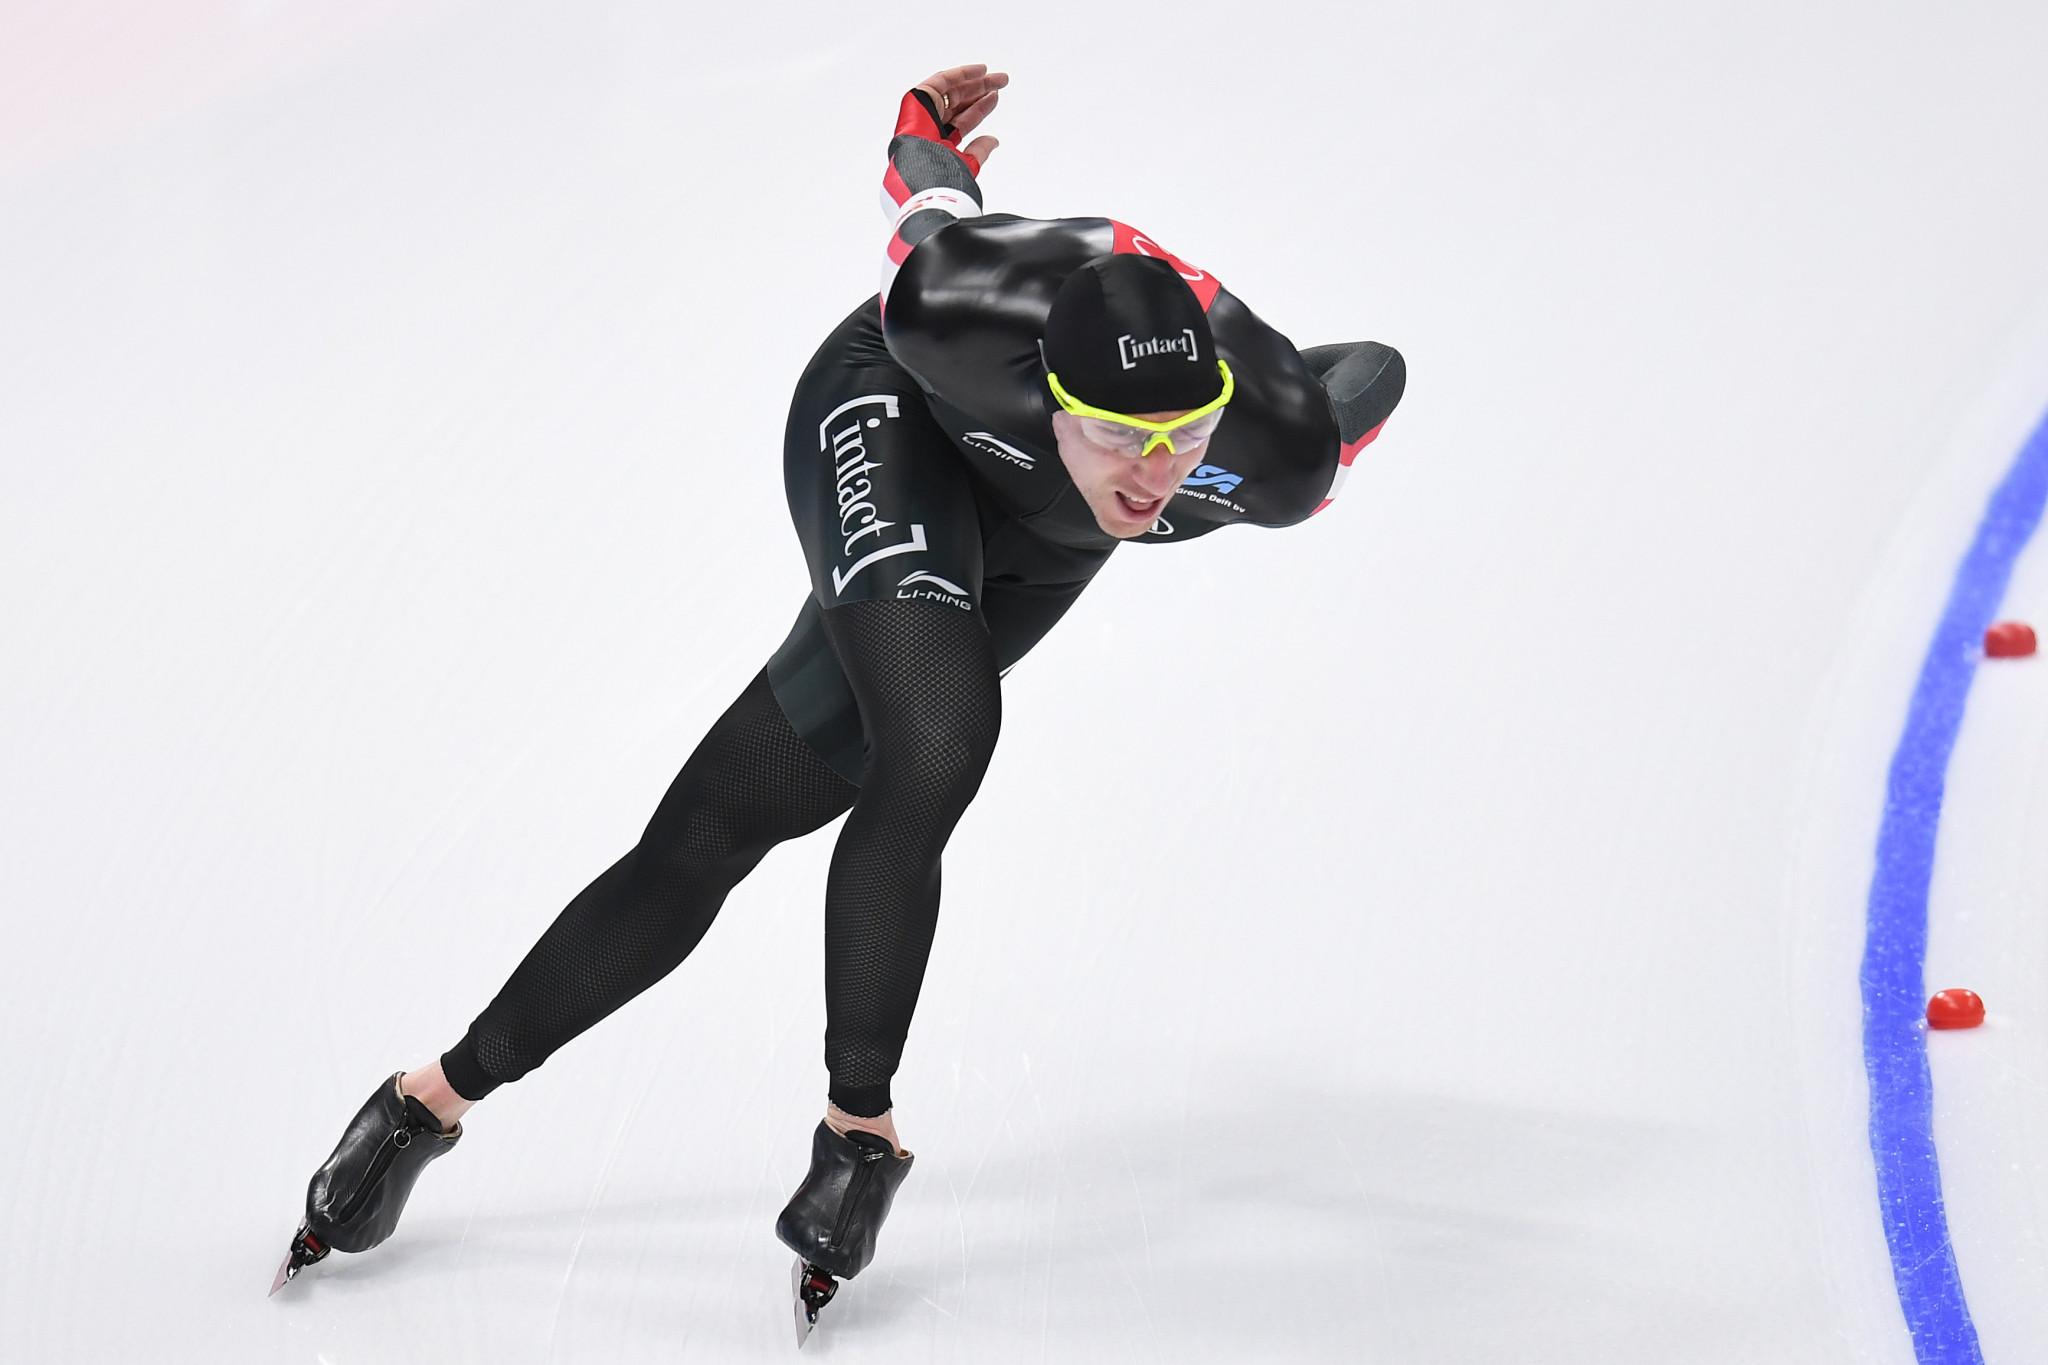 Ted-Jan Bloemen broke the men's 5000m world record ©Getty Images